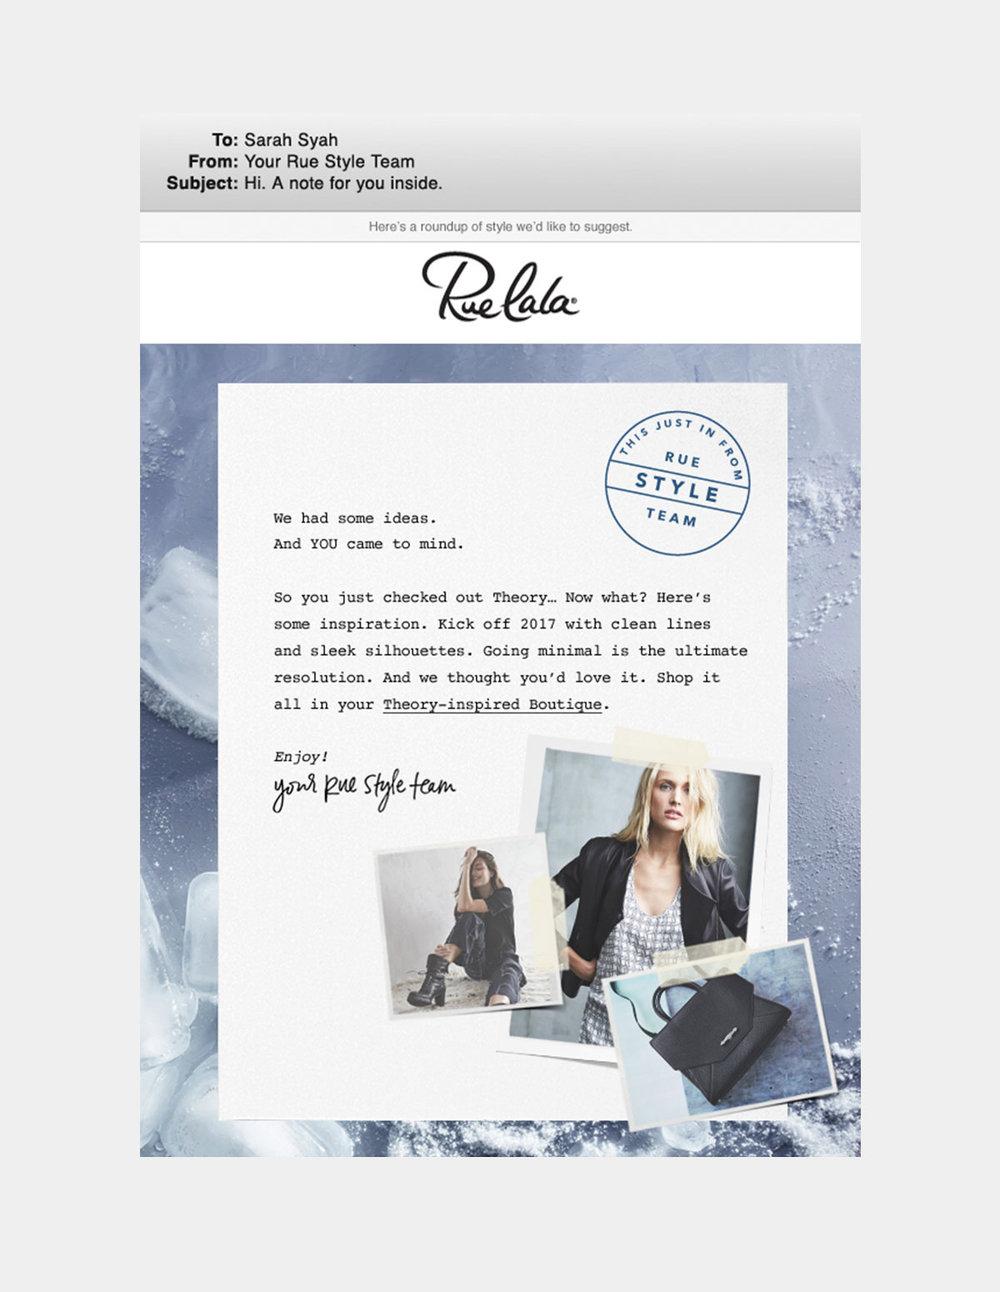 Laura-vanessa-gonzalez-lvg-lvgdesign-lvgworks-art-direction-director-artist-graphic-design-designer-photography-photographer-fashion-editorial-tabletop-set-boston-freelance-type-typeography-email-marketing-3.jpg